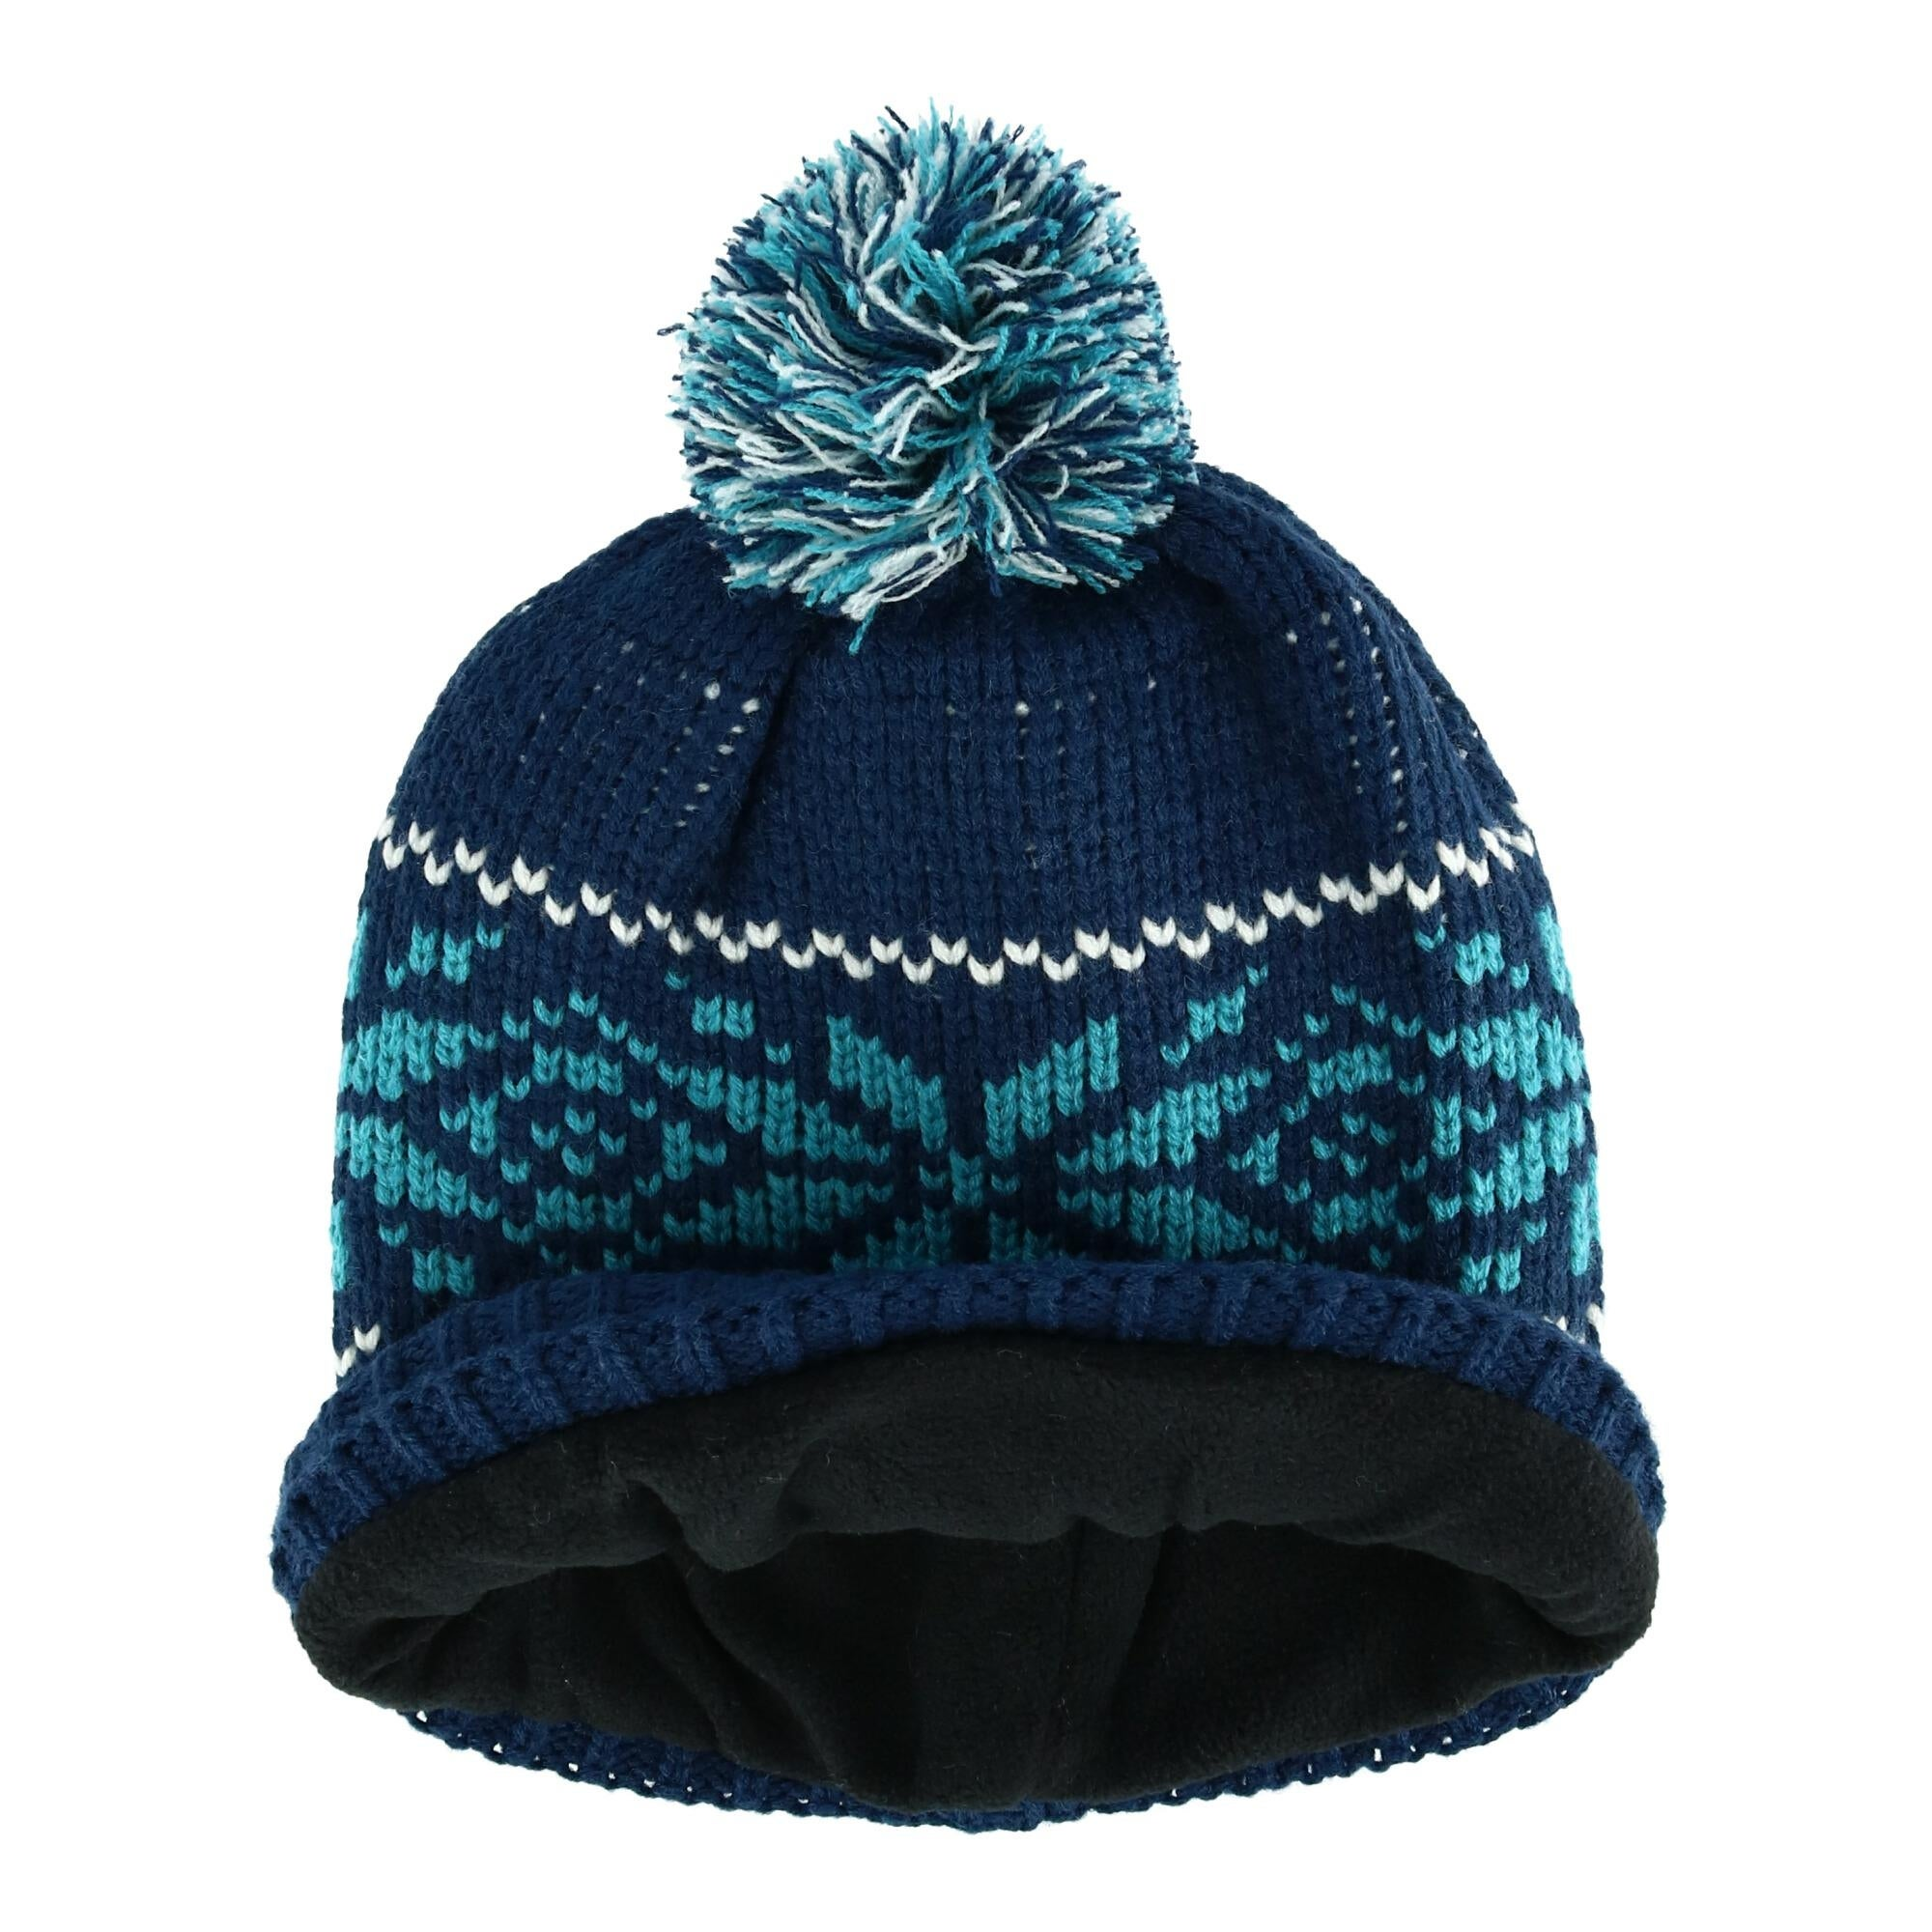 UNISEX MENS  LADIES KNITTED PERUVIAN HAT FLEECE LINED  EARFLAPS BLUE SNOWFLAKE